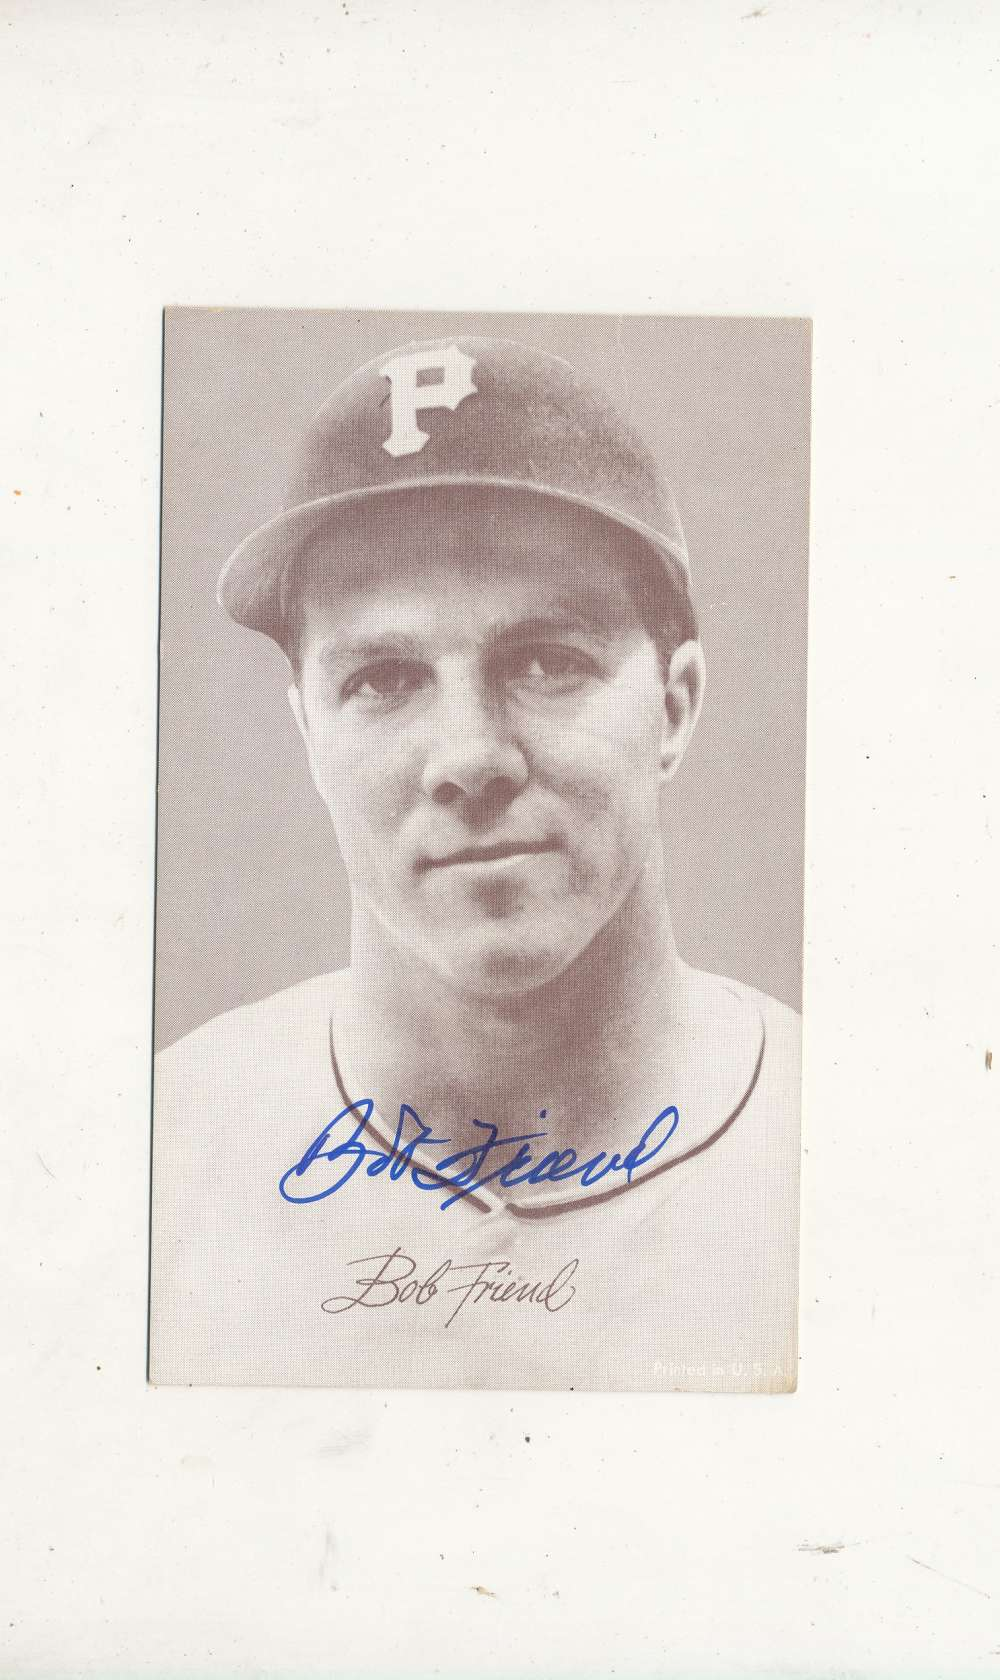 Bob Friend Pirates  Signed 1946-1966 exhibit card